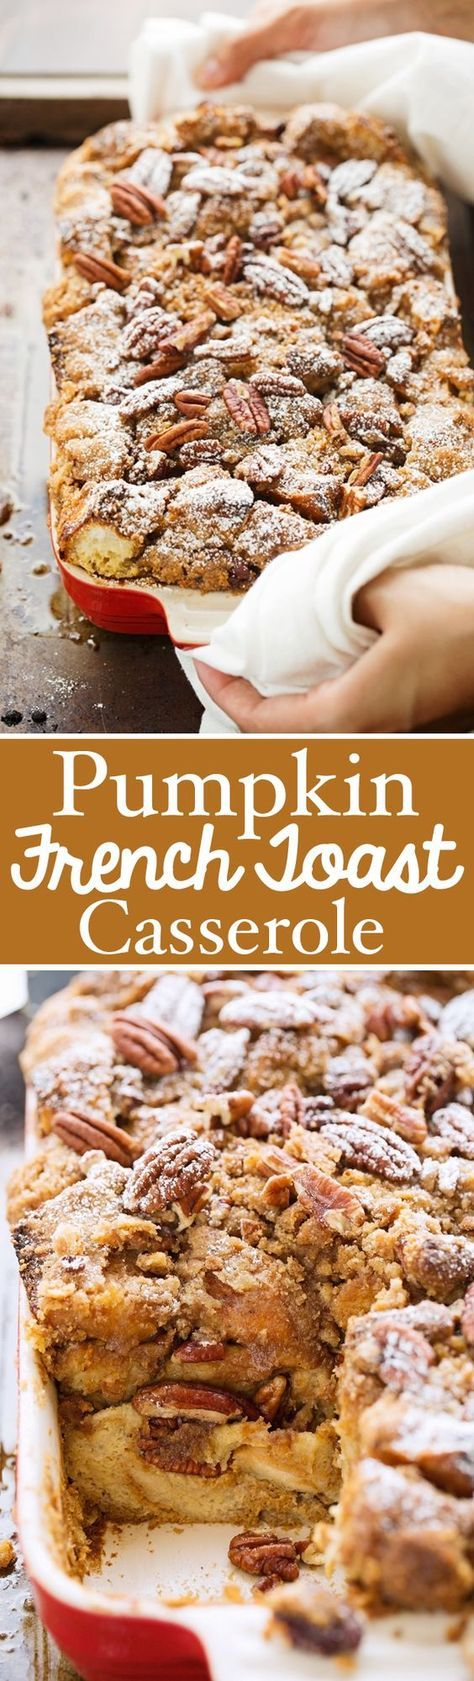 Pumpkin French Toast Casserole Recipe | Little Spice Jar